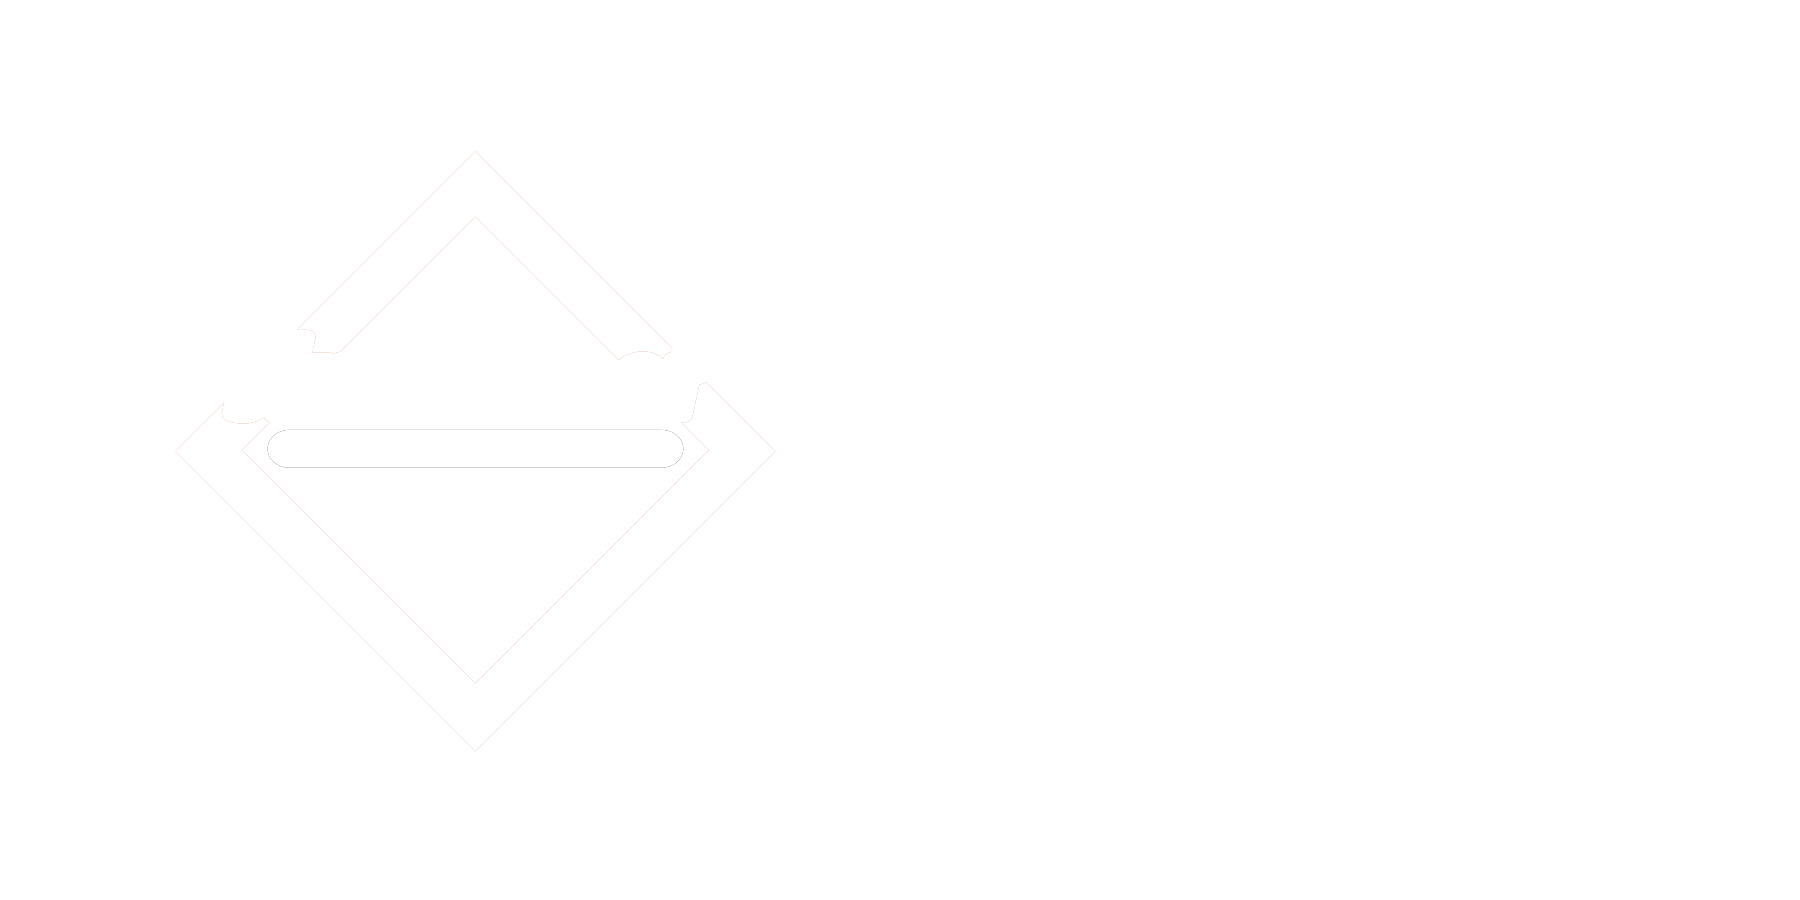 jmr_sj co_logo_1 color_final